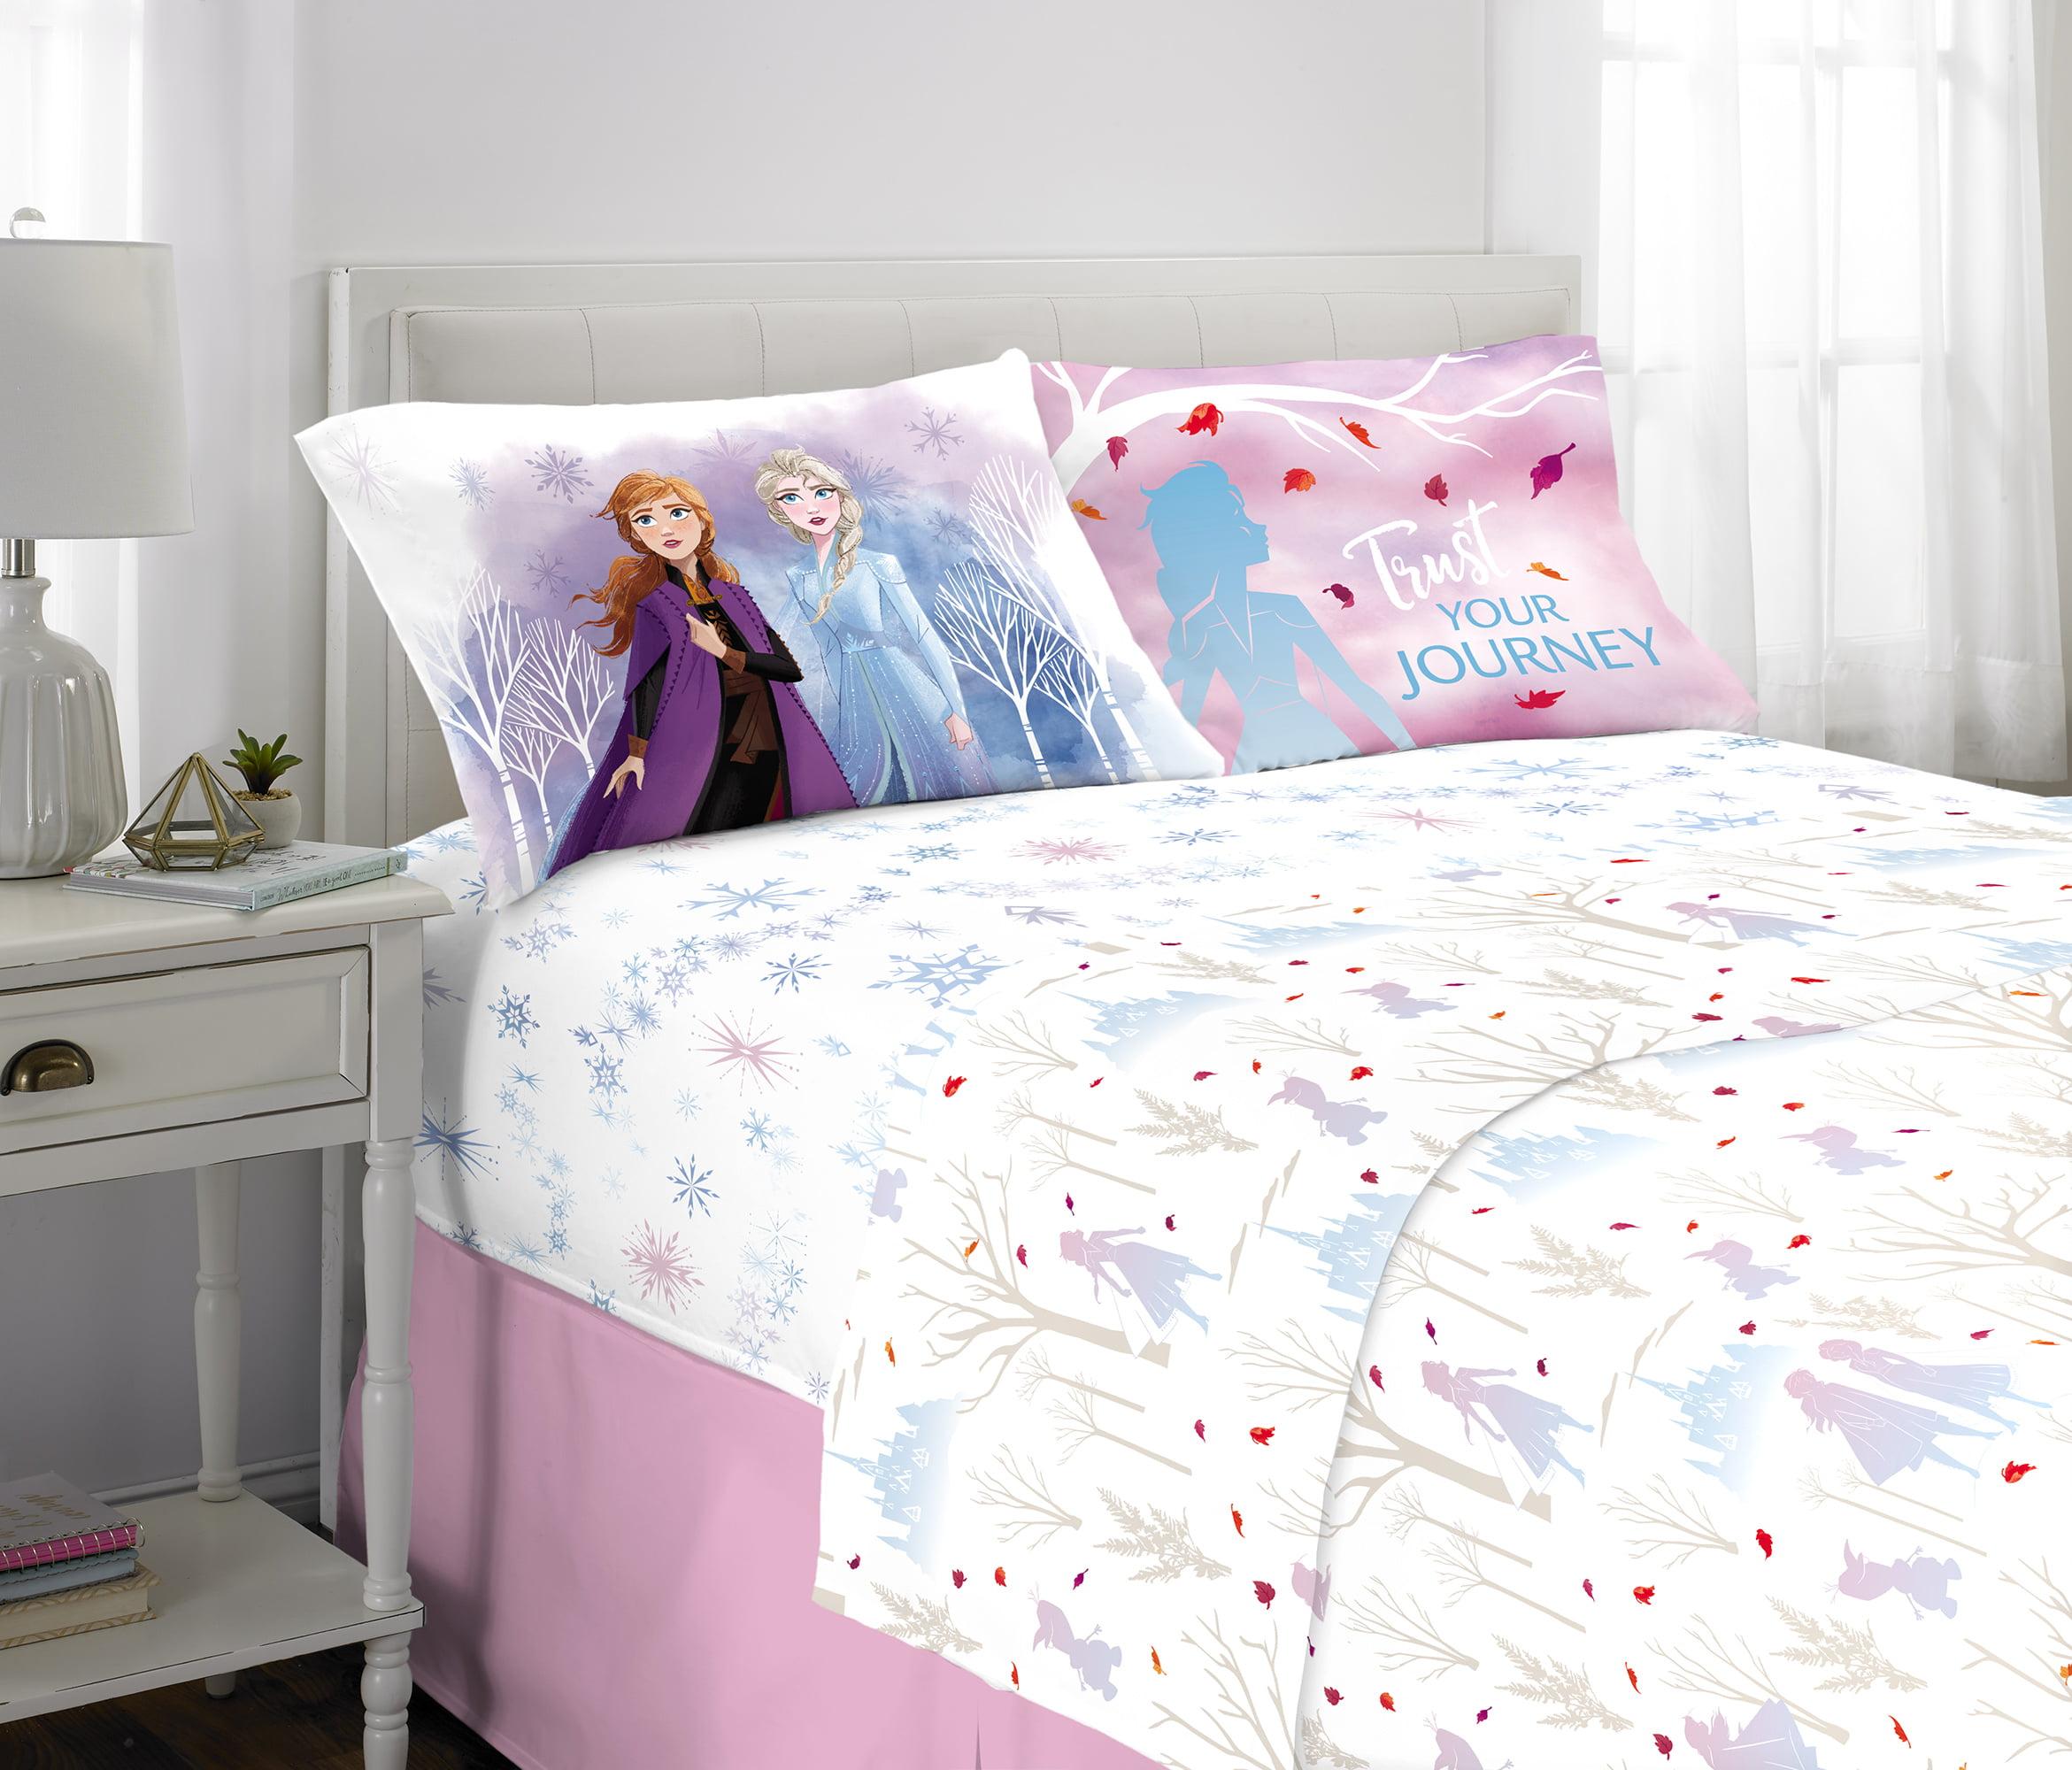 Frozen 2 Sheet Set, Kids Bedding, 4-Piece Full Size ...